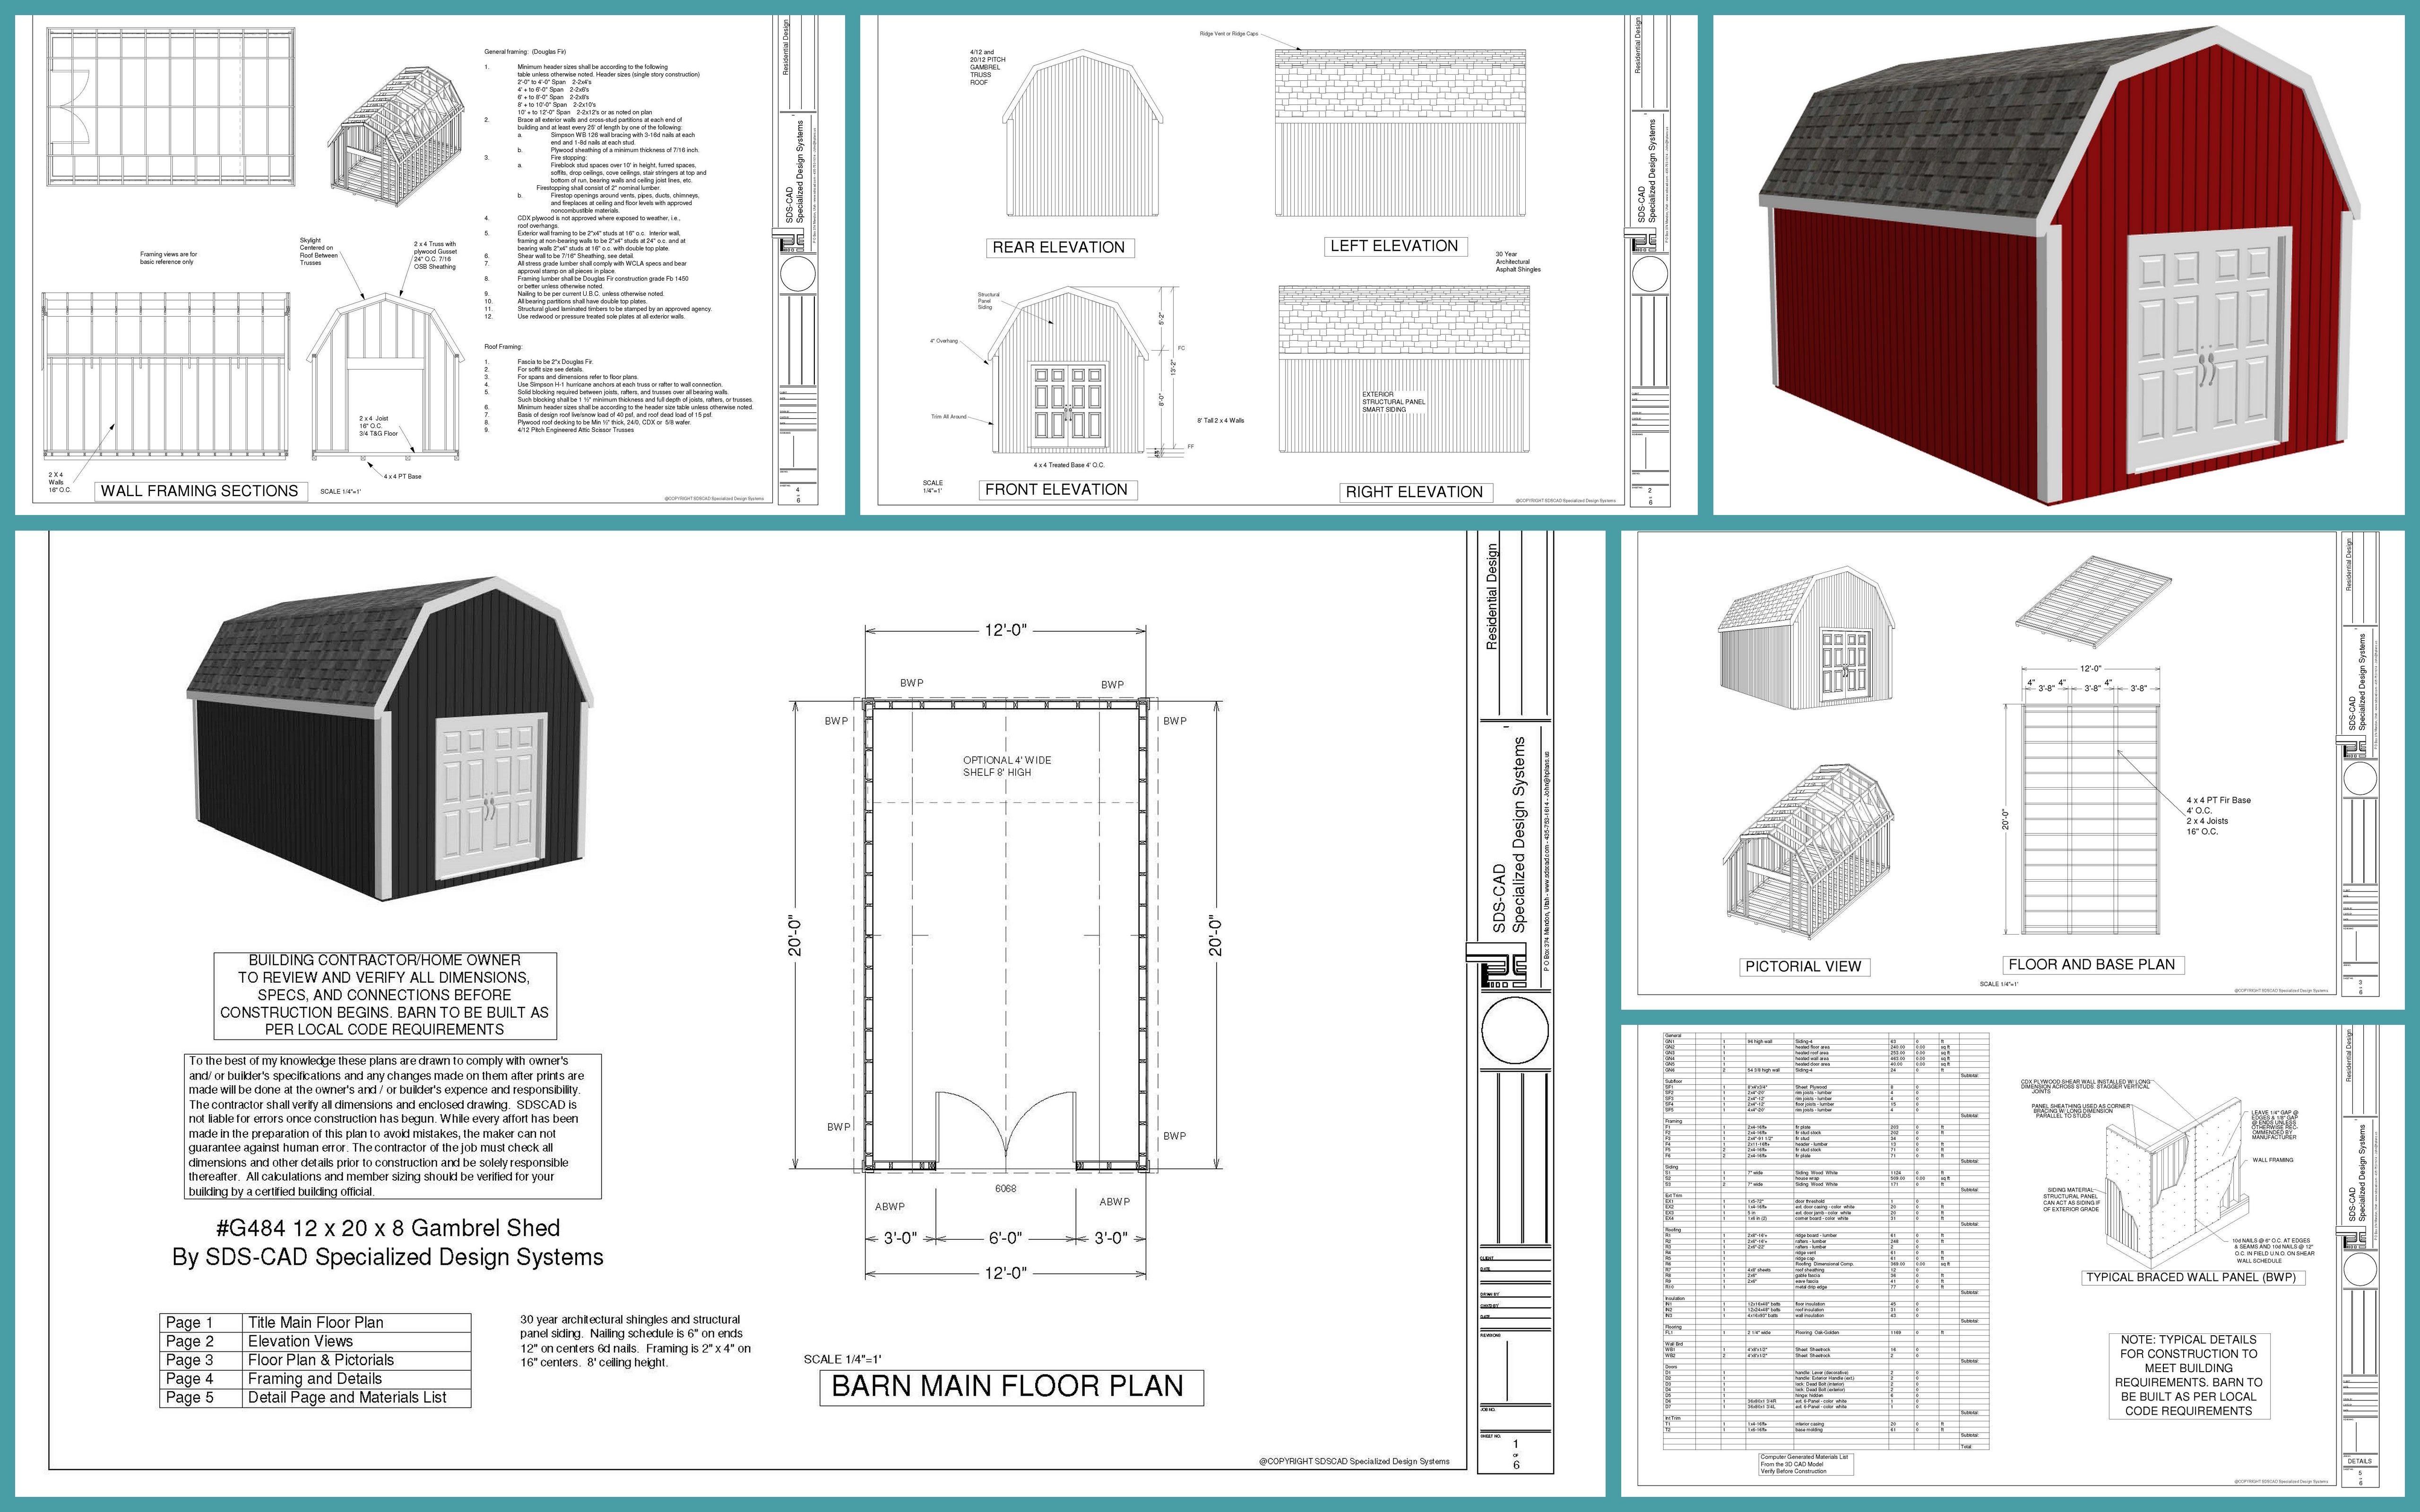 G484 12 X 20 Gambrel Barn Shed Plans Shed Diy Storage